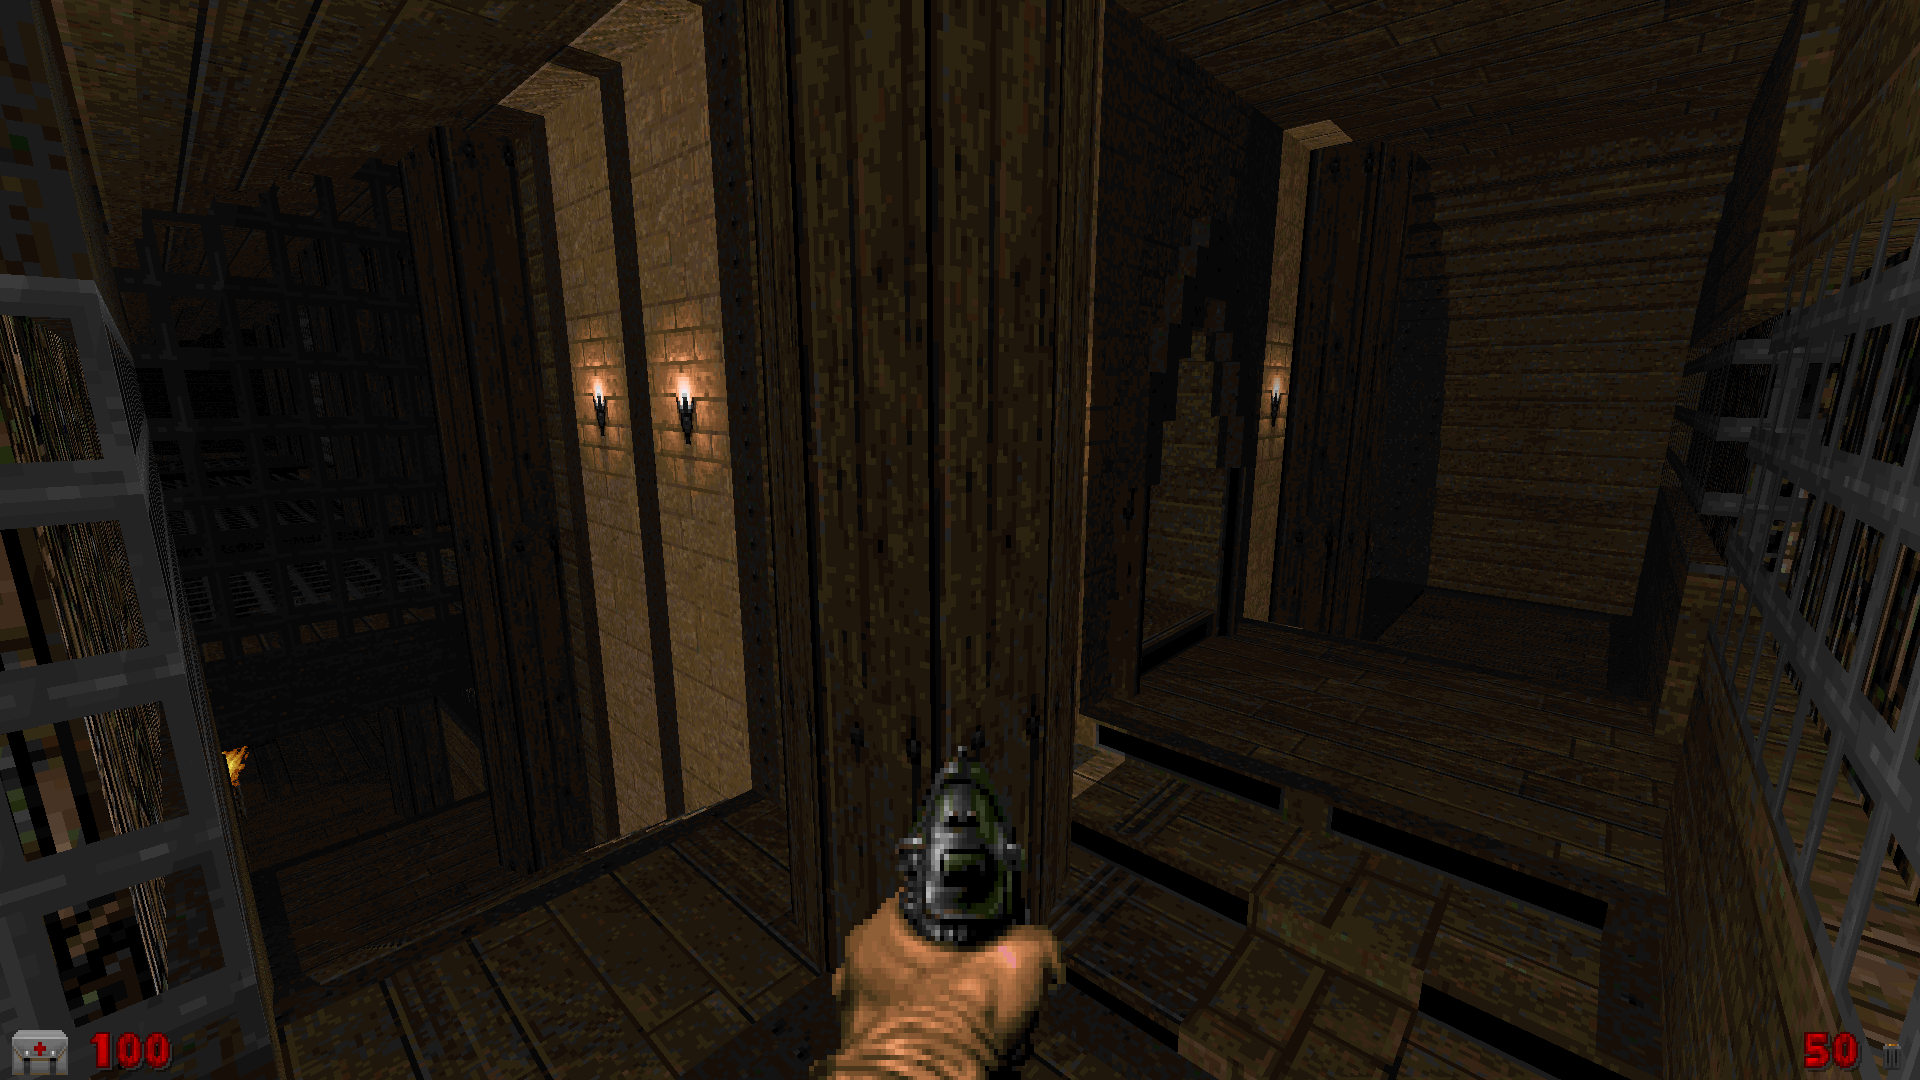 Screenshot_Doom_20200502_163327.png.055c65acf3b7963bb1cea8db5c8841a5.png